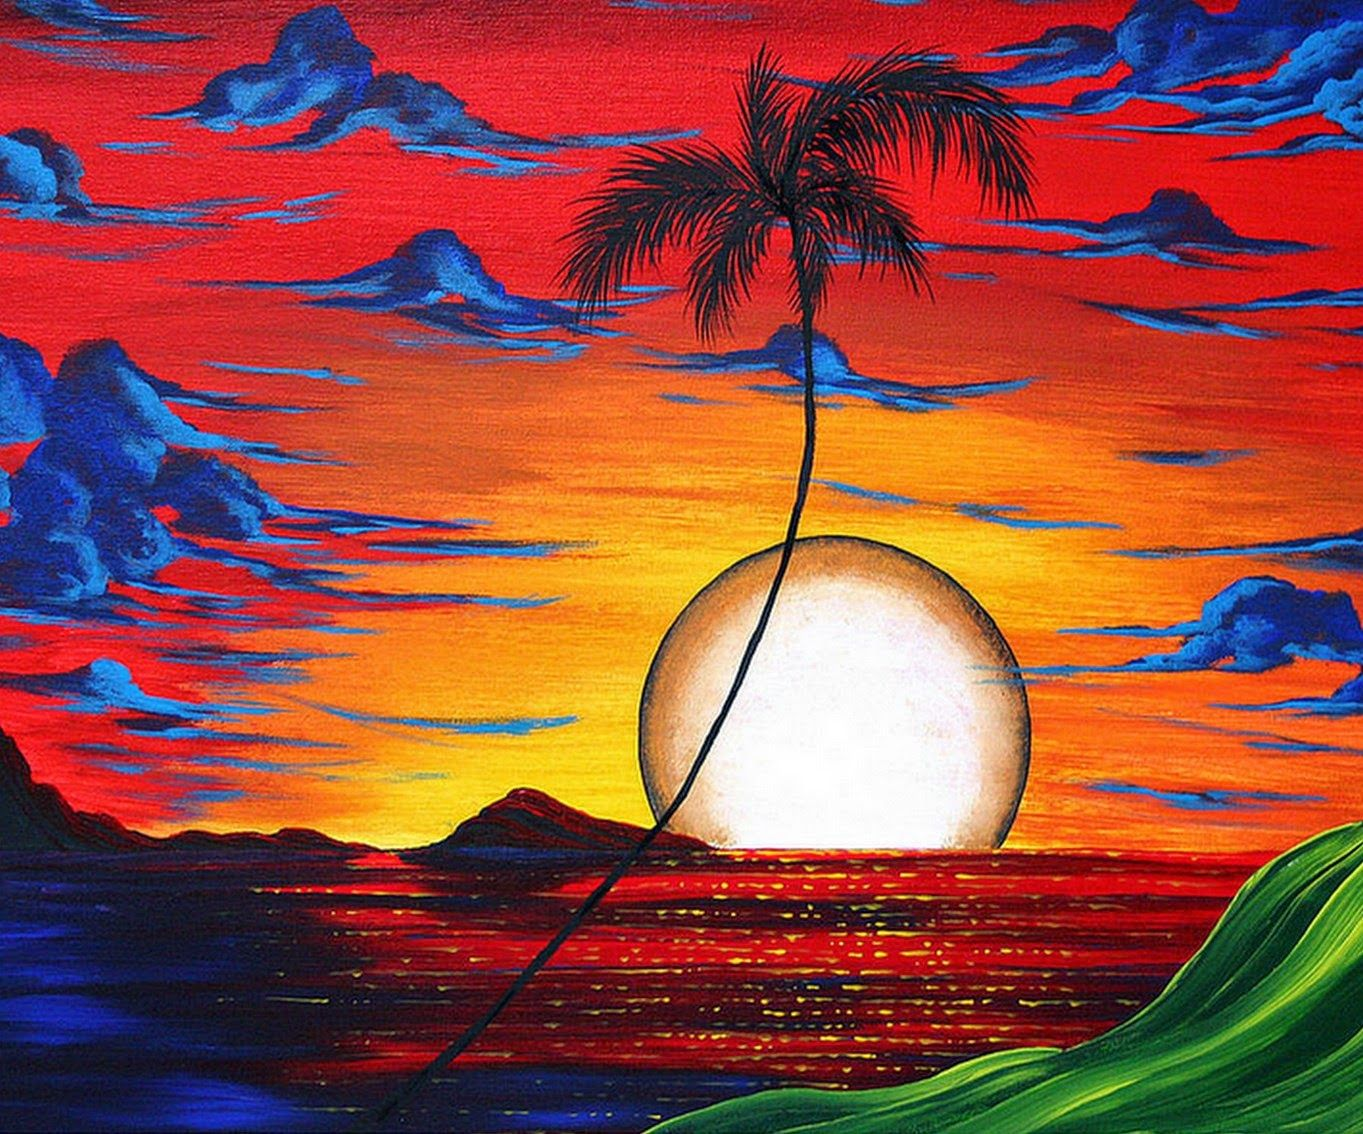 Dibujos De Paisajes Buscar Con Google Pinturas Abstractas Paisajes Pintados Con Acuarela Dibujos Abstractos